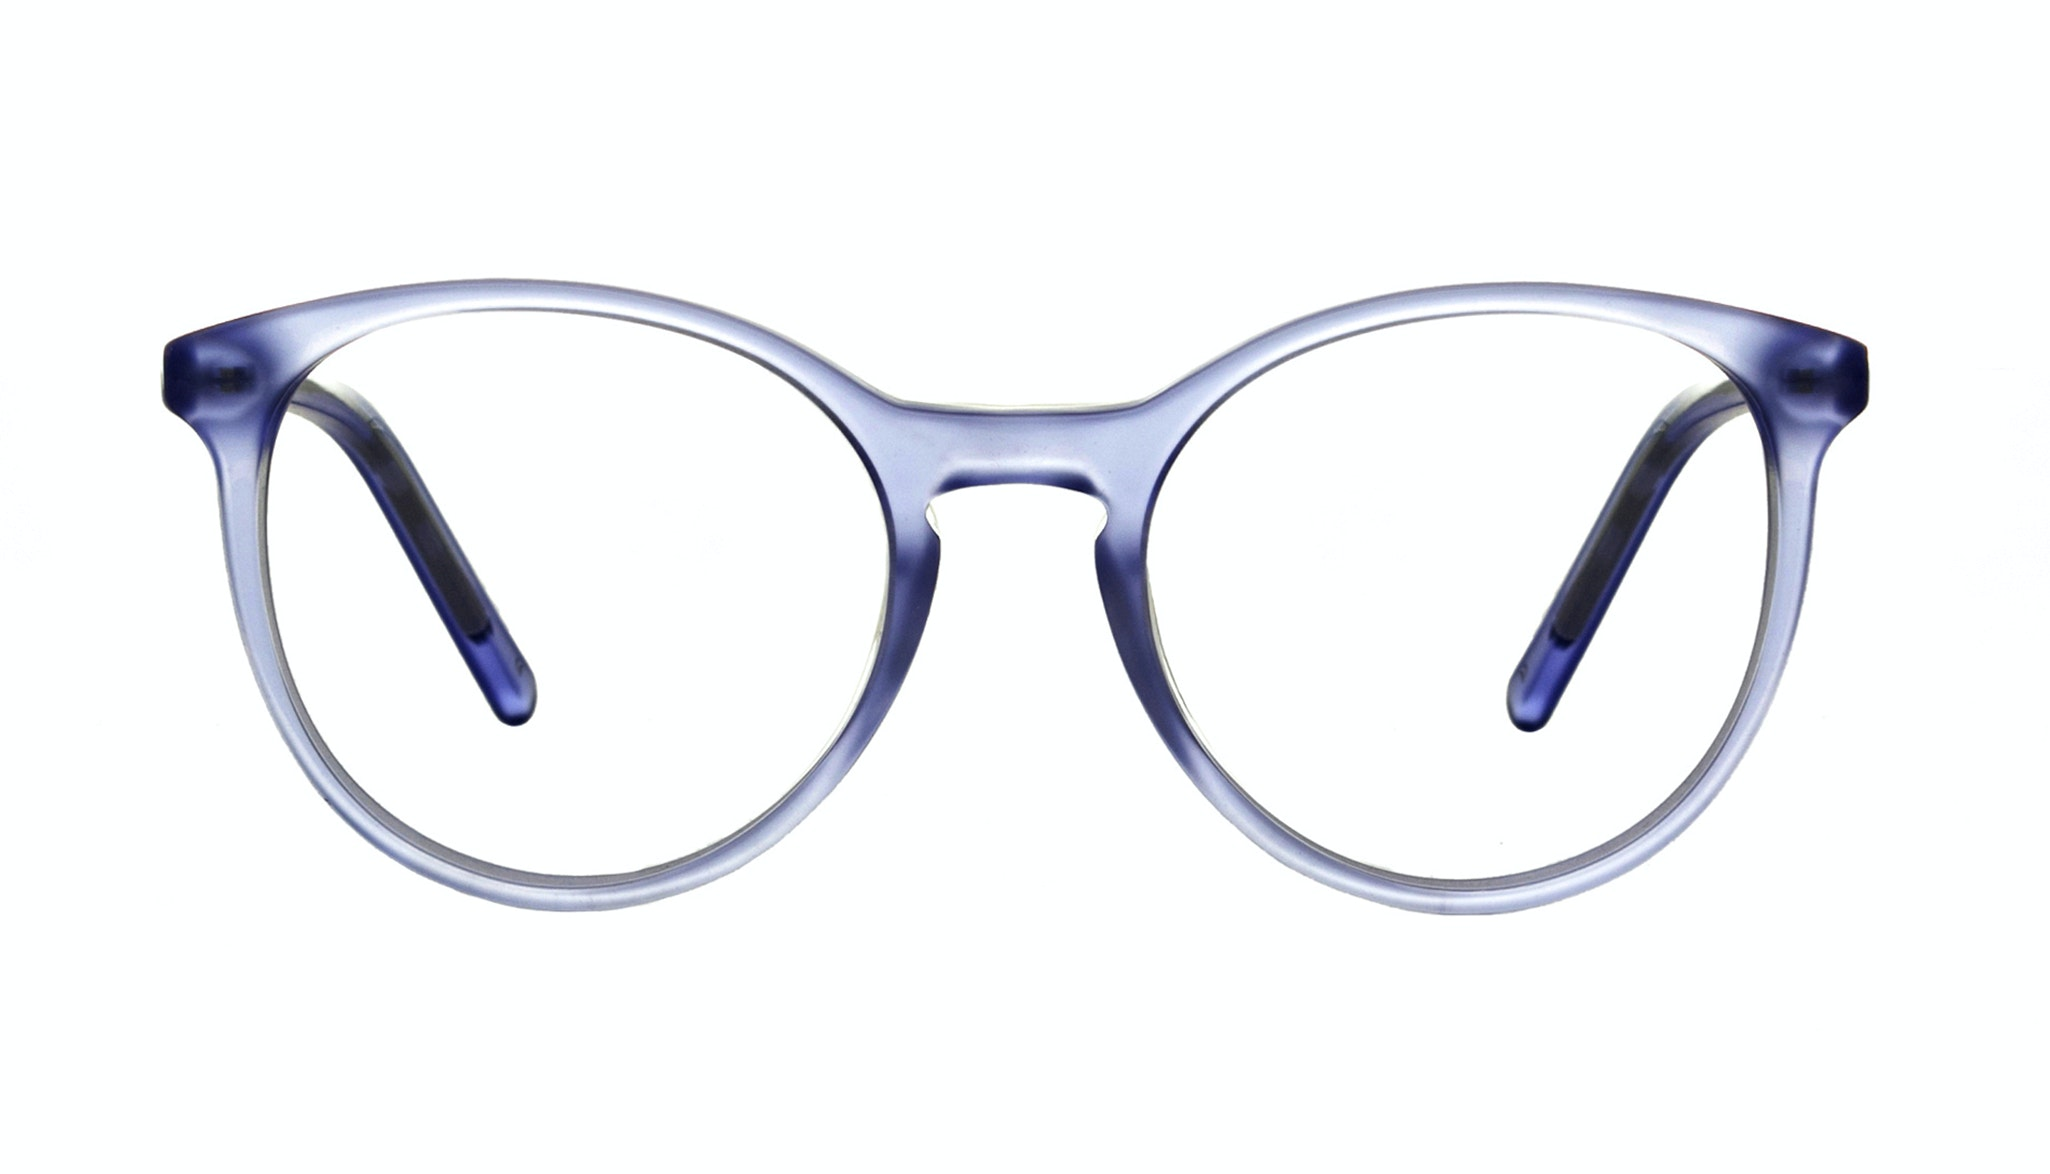 Affordable Fashion Glasses Round Eyeglasses Women Embrace Serenity Front